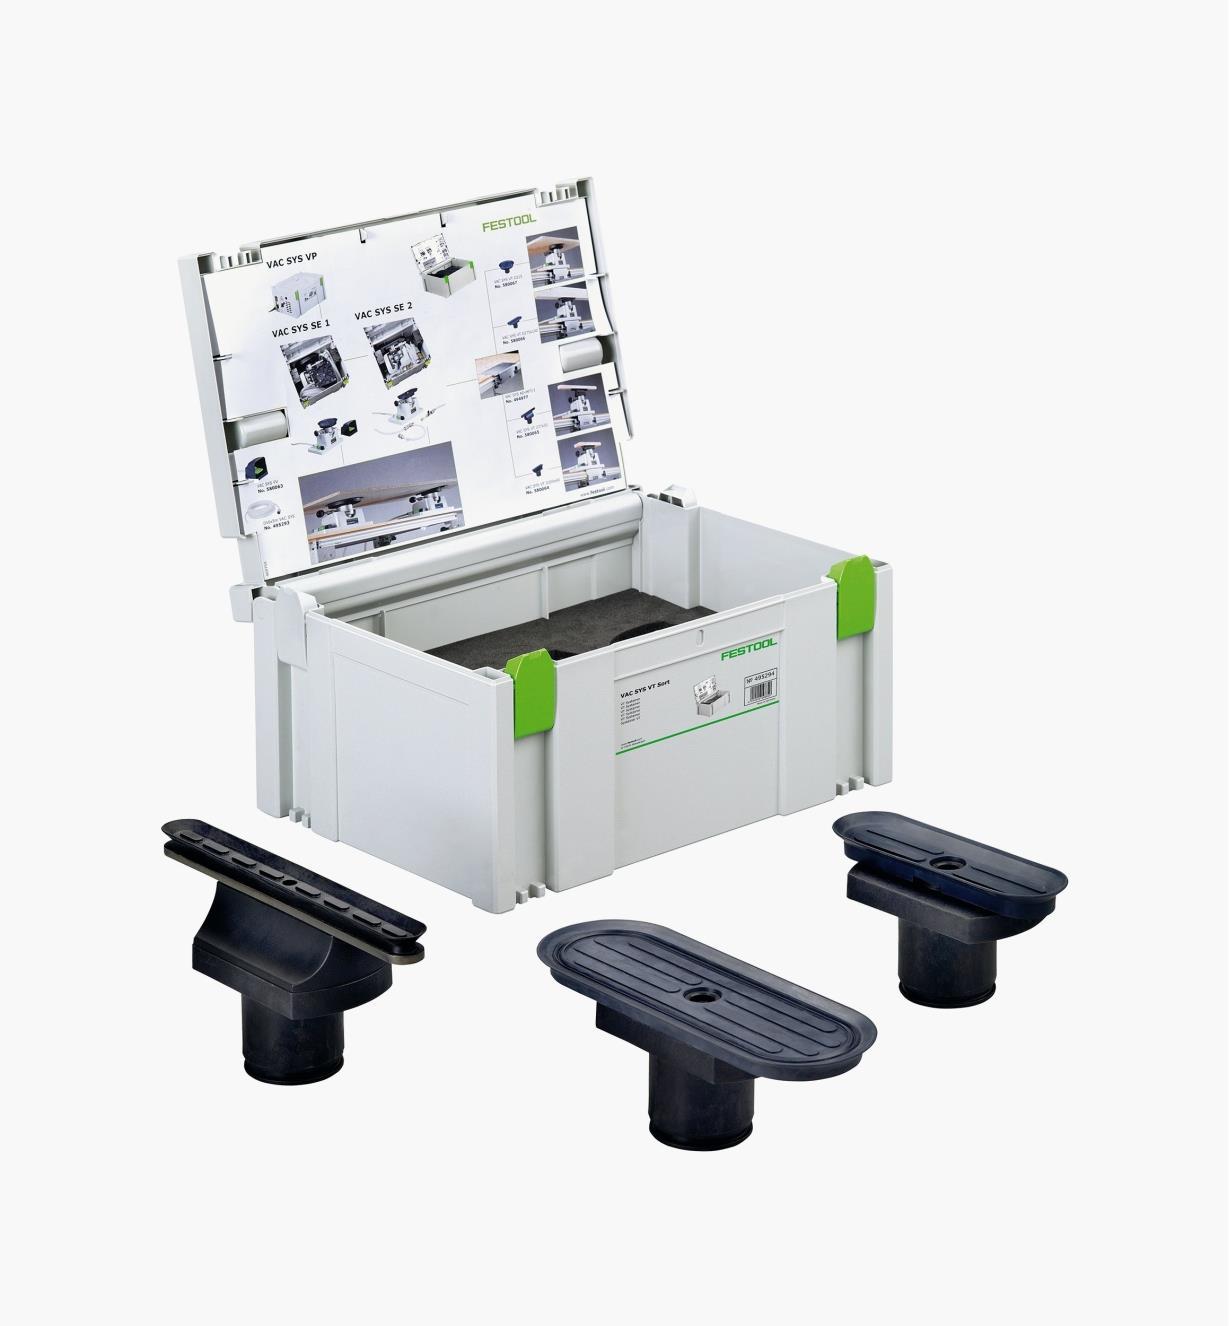 ZA495294 - VAC SYS Accessory Set